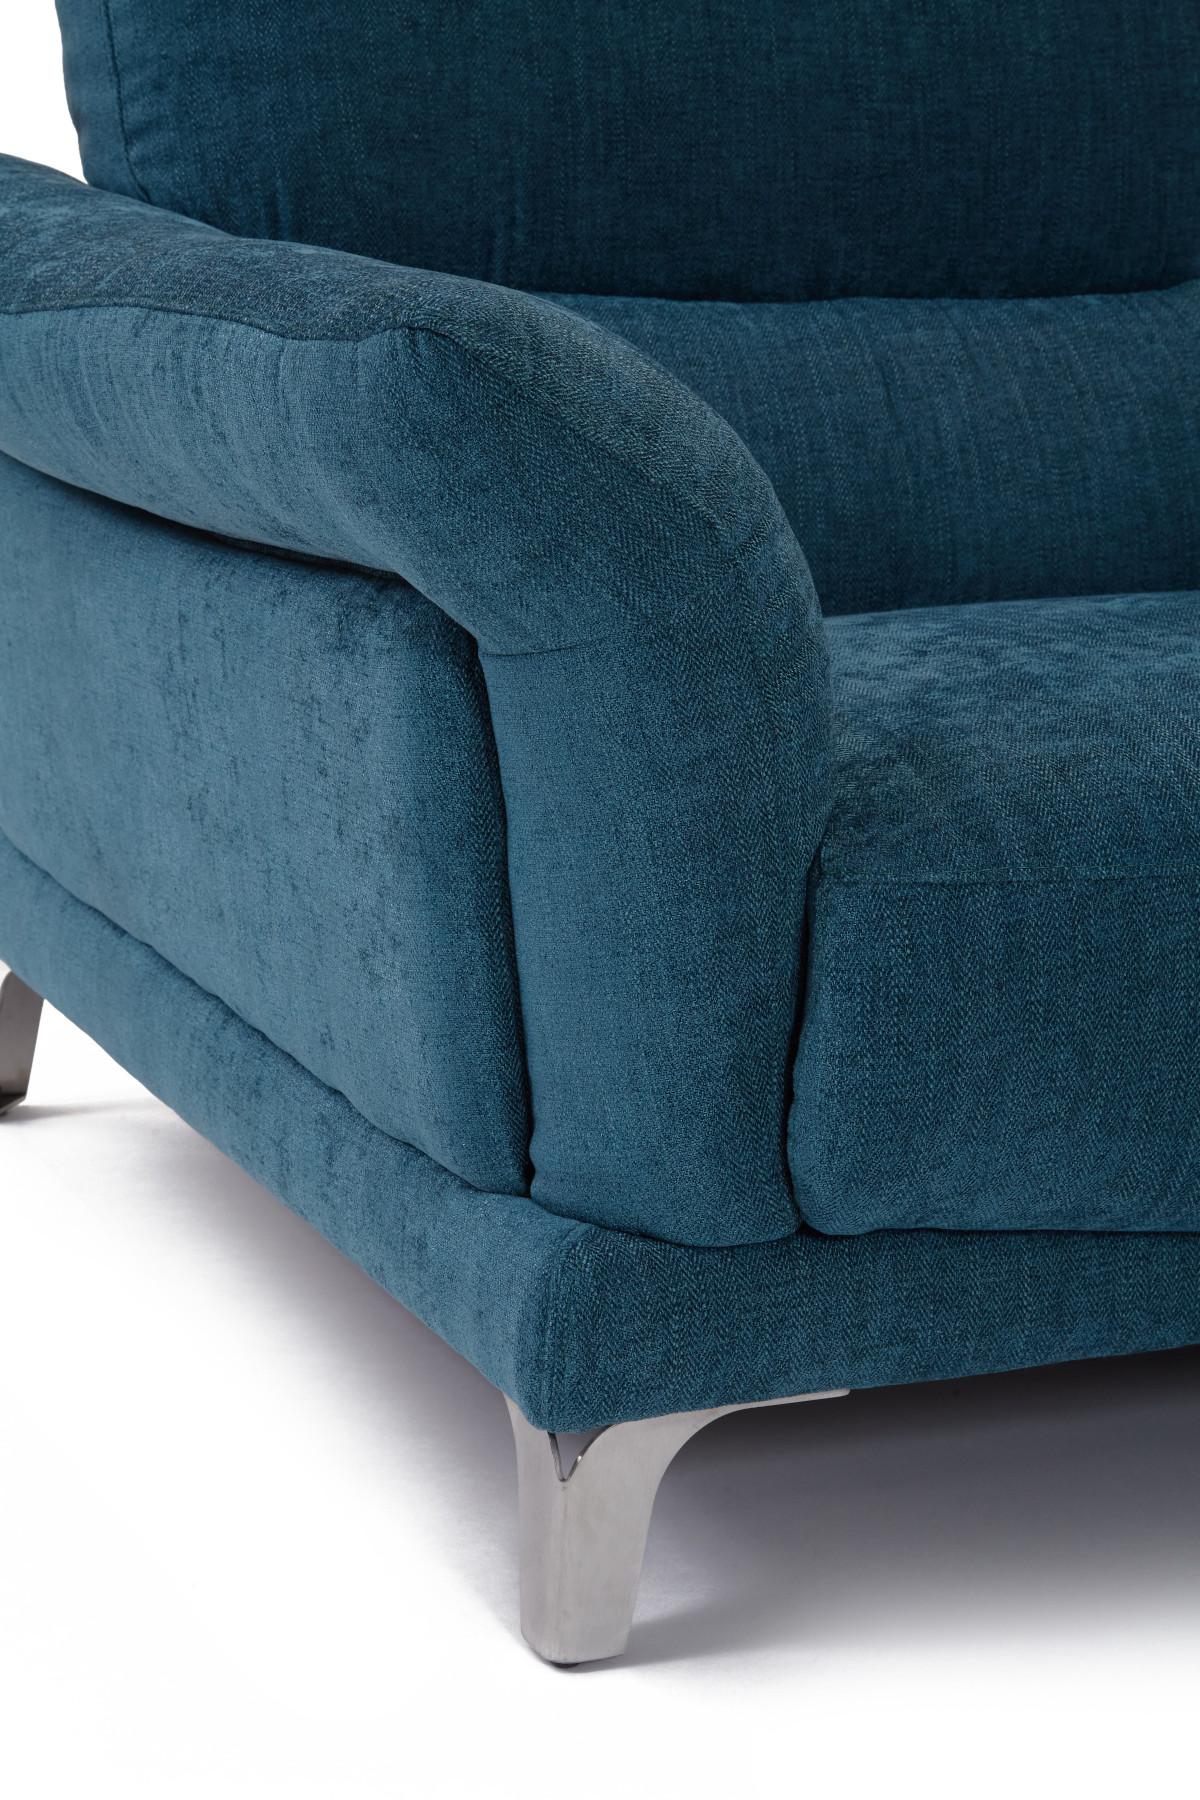 Sierra 2 Seater Sofa